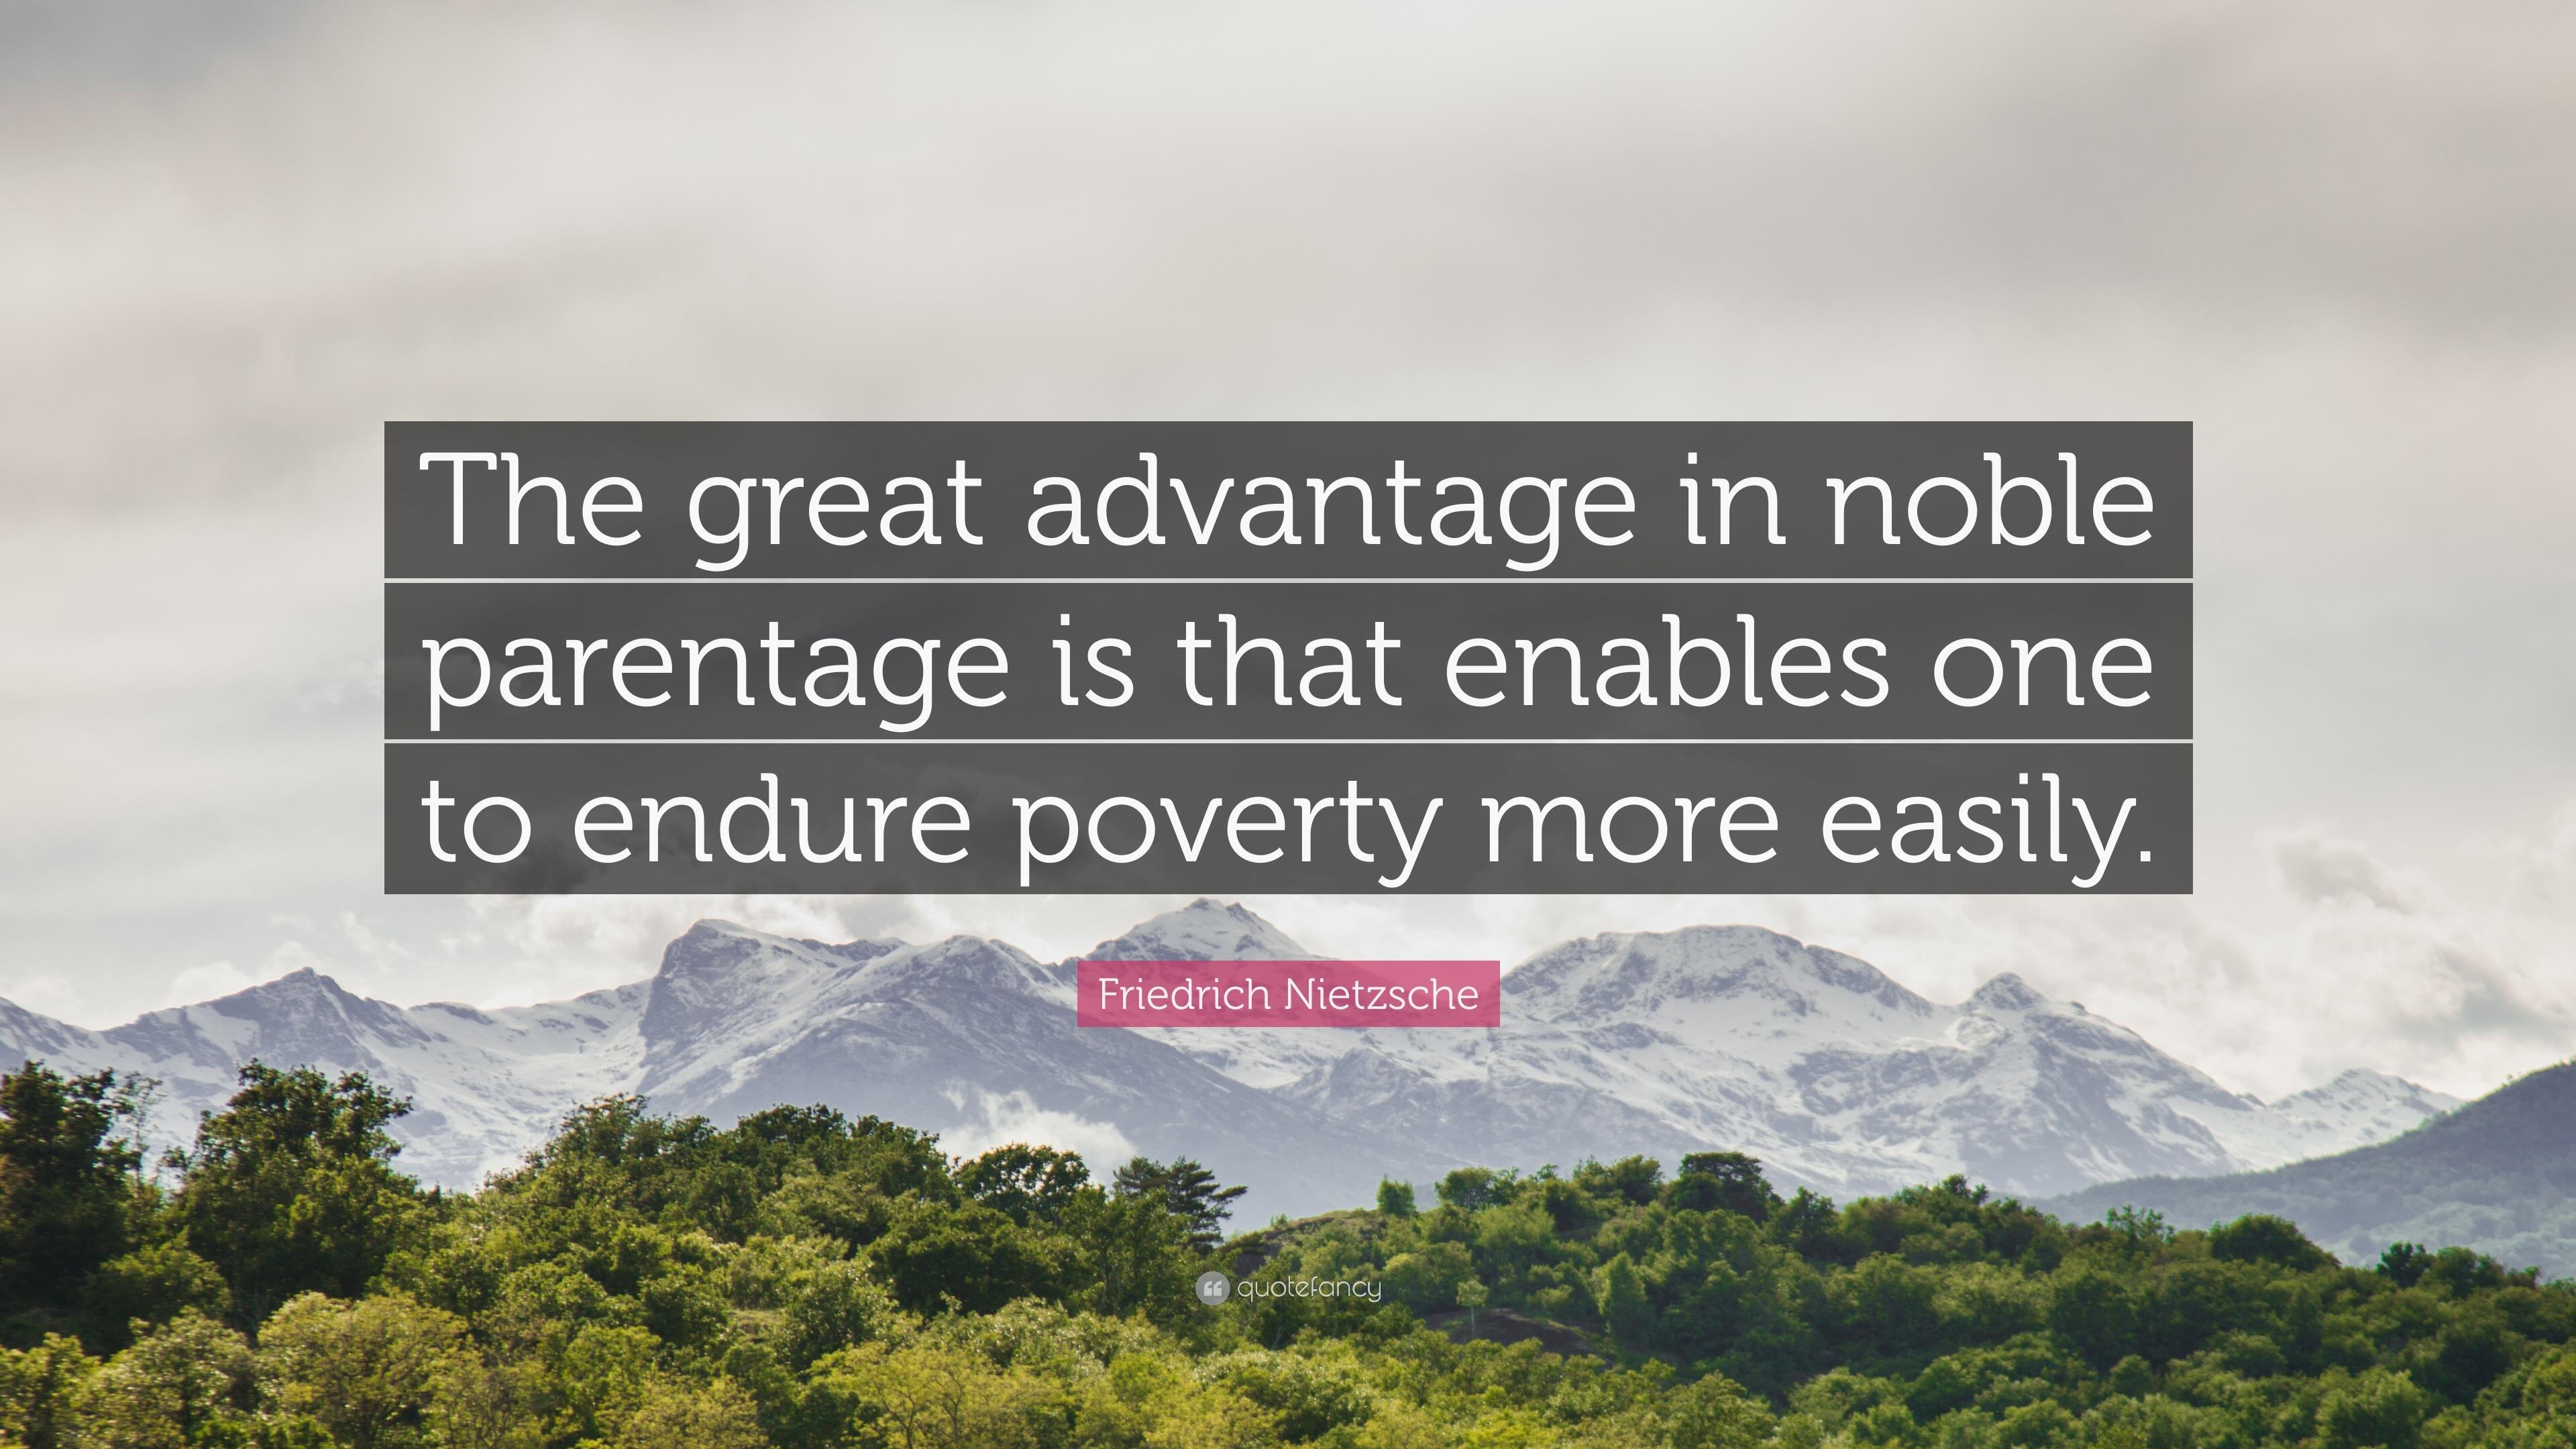 Friedrich Nietzsche Quote The Great Advantage In Noble Parentage